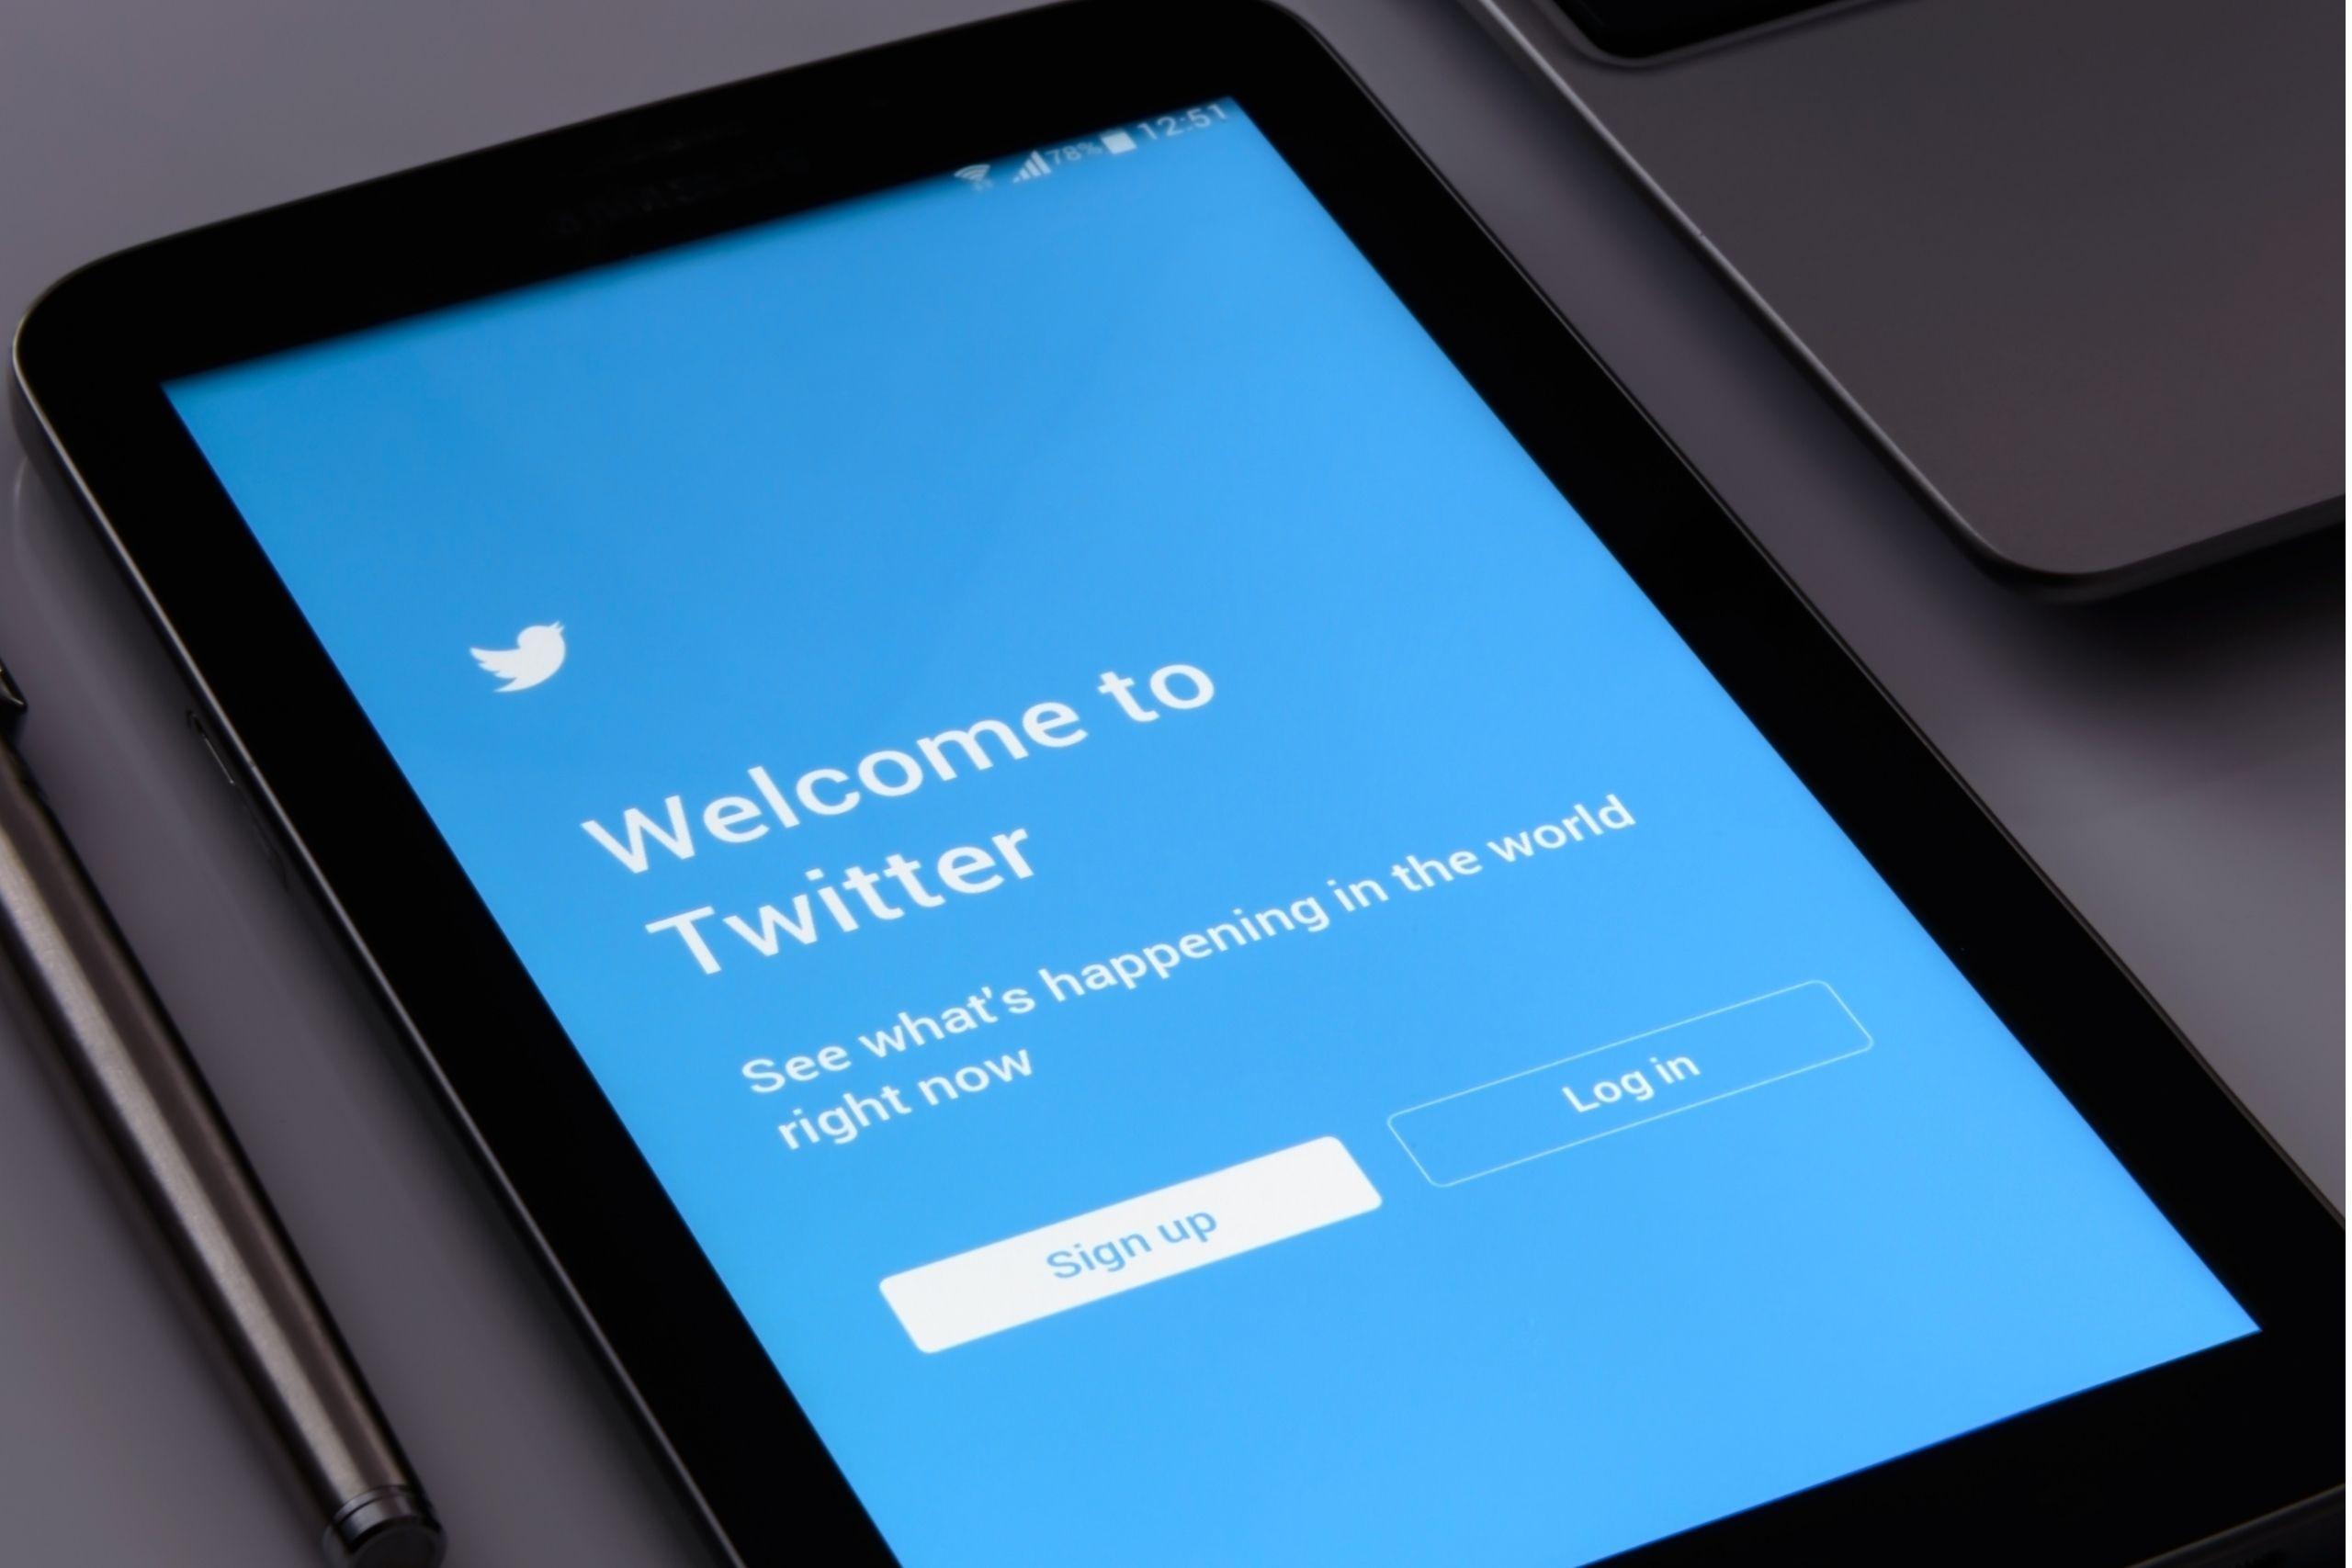 Twitter login page on an iPad